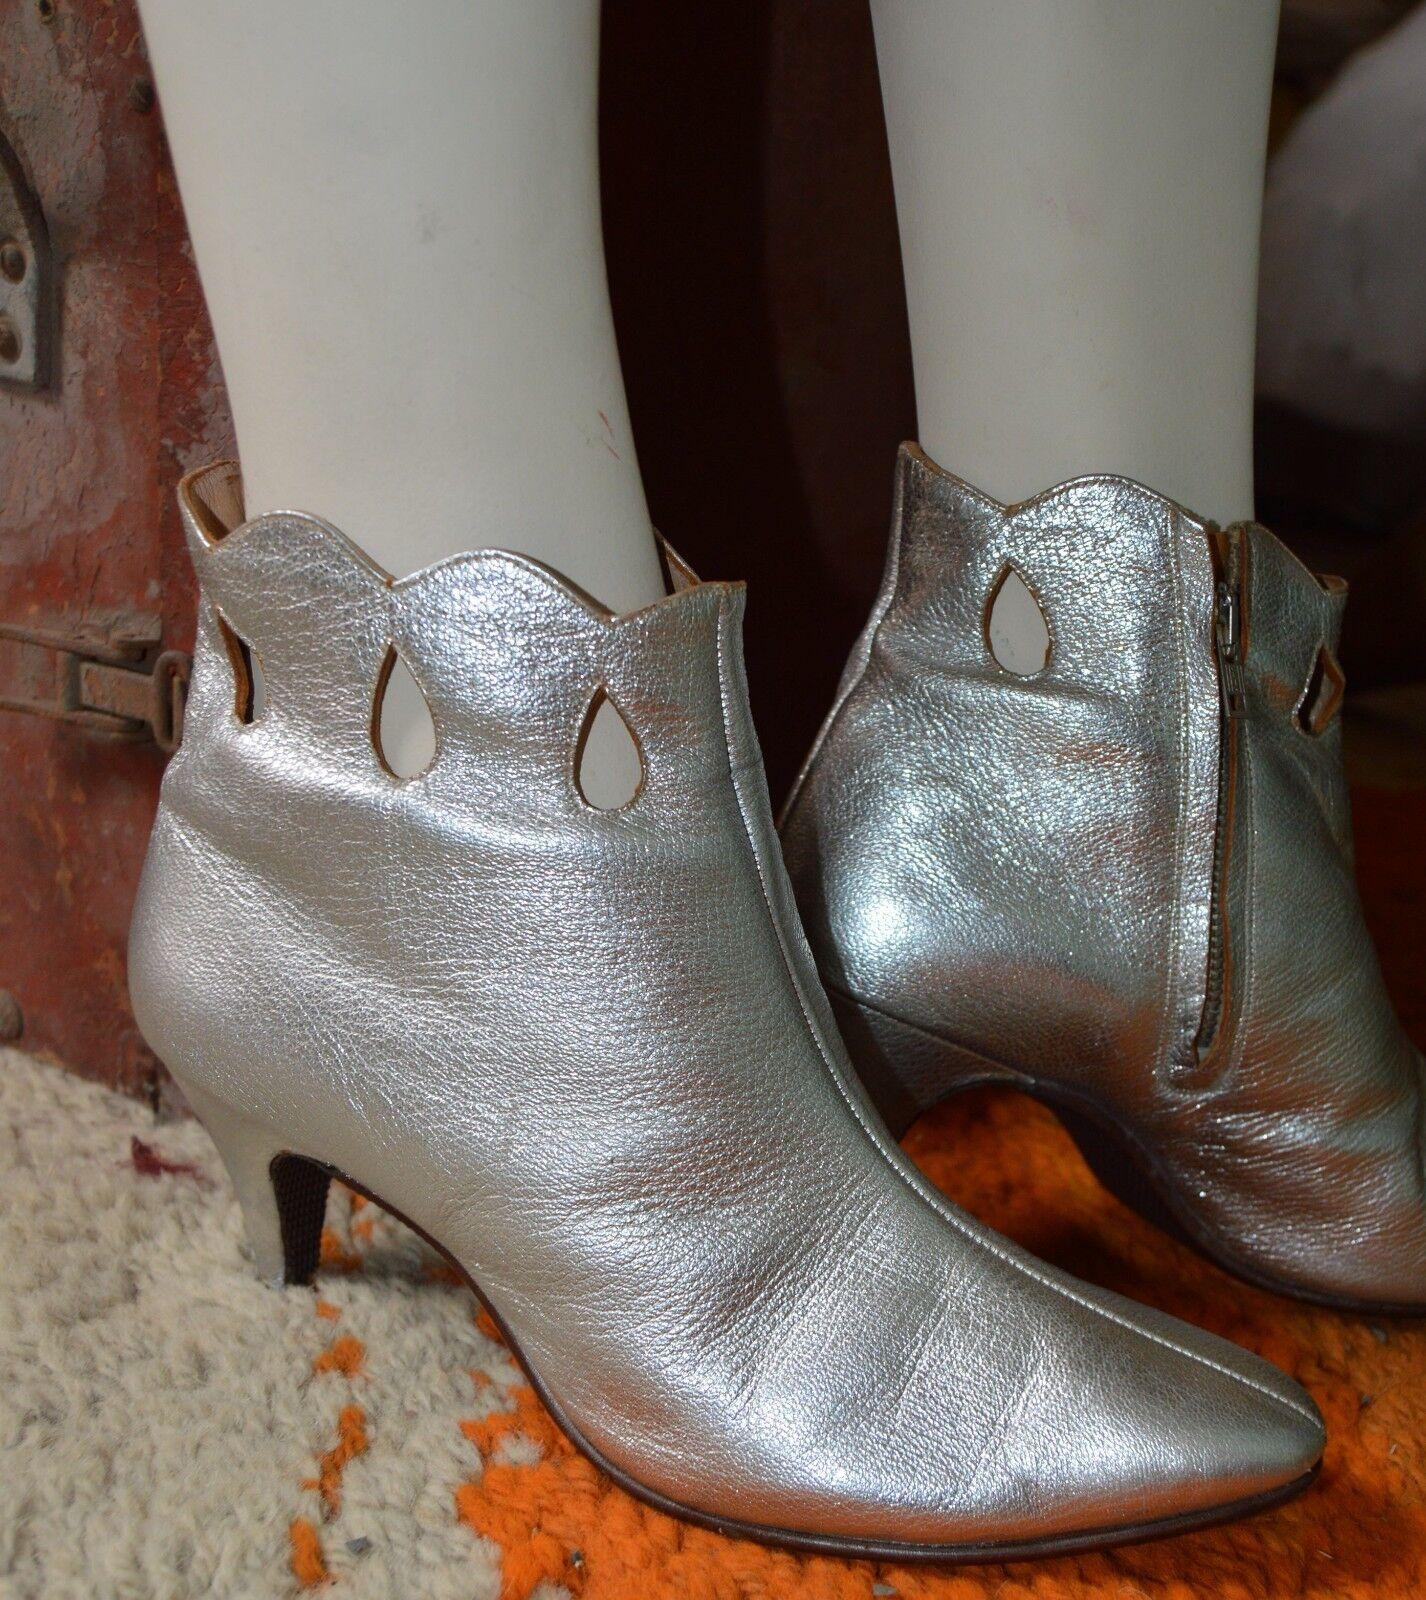 Grandes zapatos con descuento Damen Stiefelette Silber 70er TRUE VINTAGE 70s Knöchelschuhe Ankle Boots Stiefel